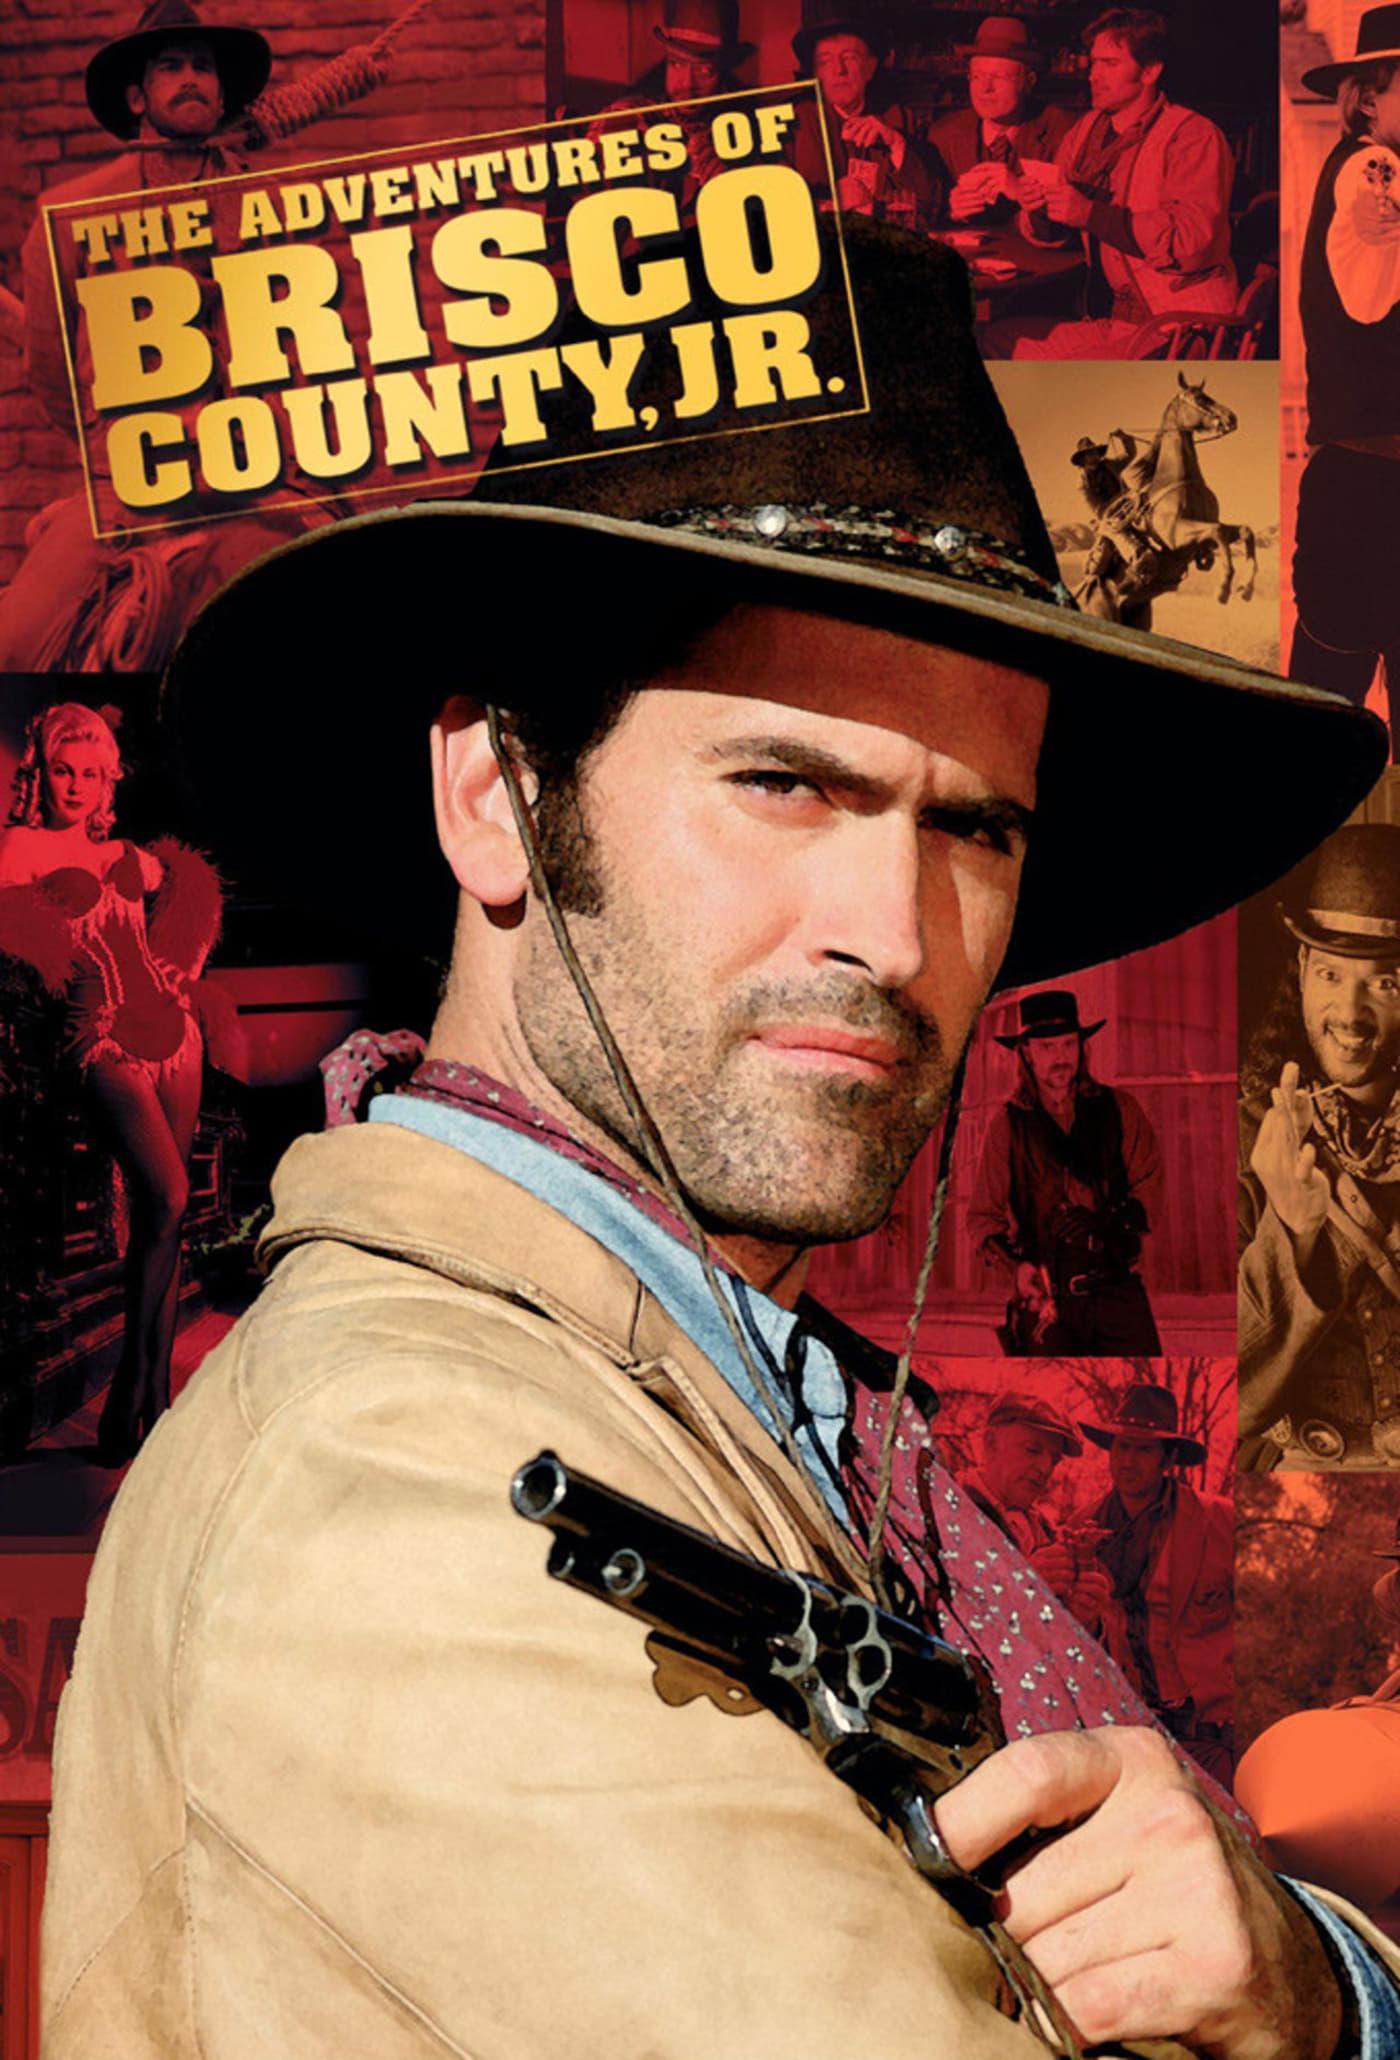 The Adventures of Brisco County, Jr.